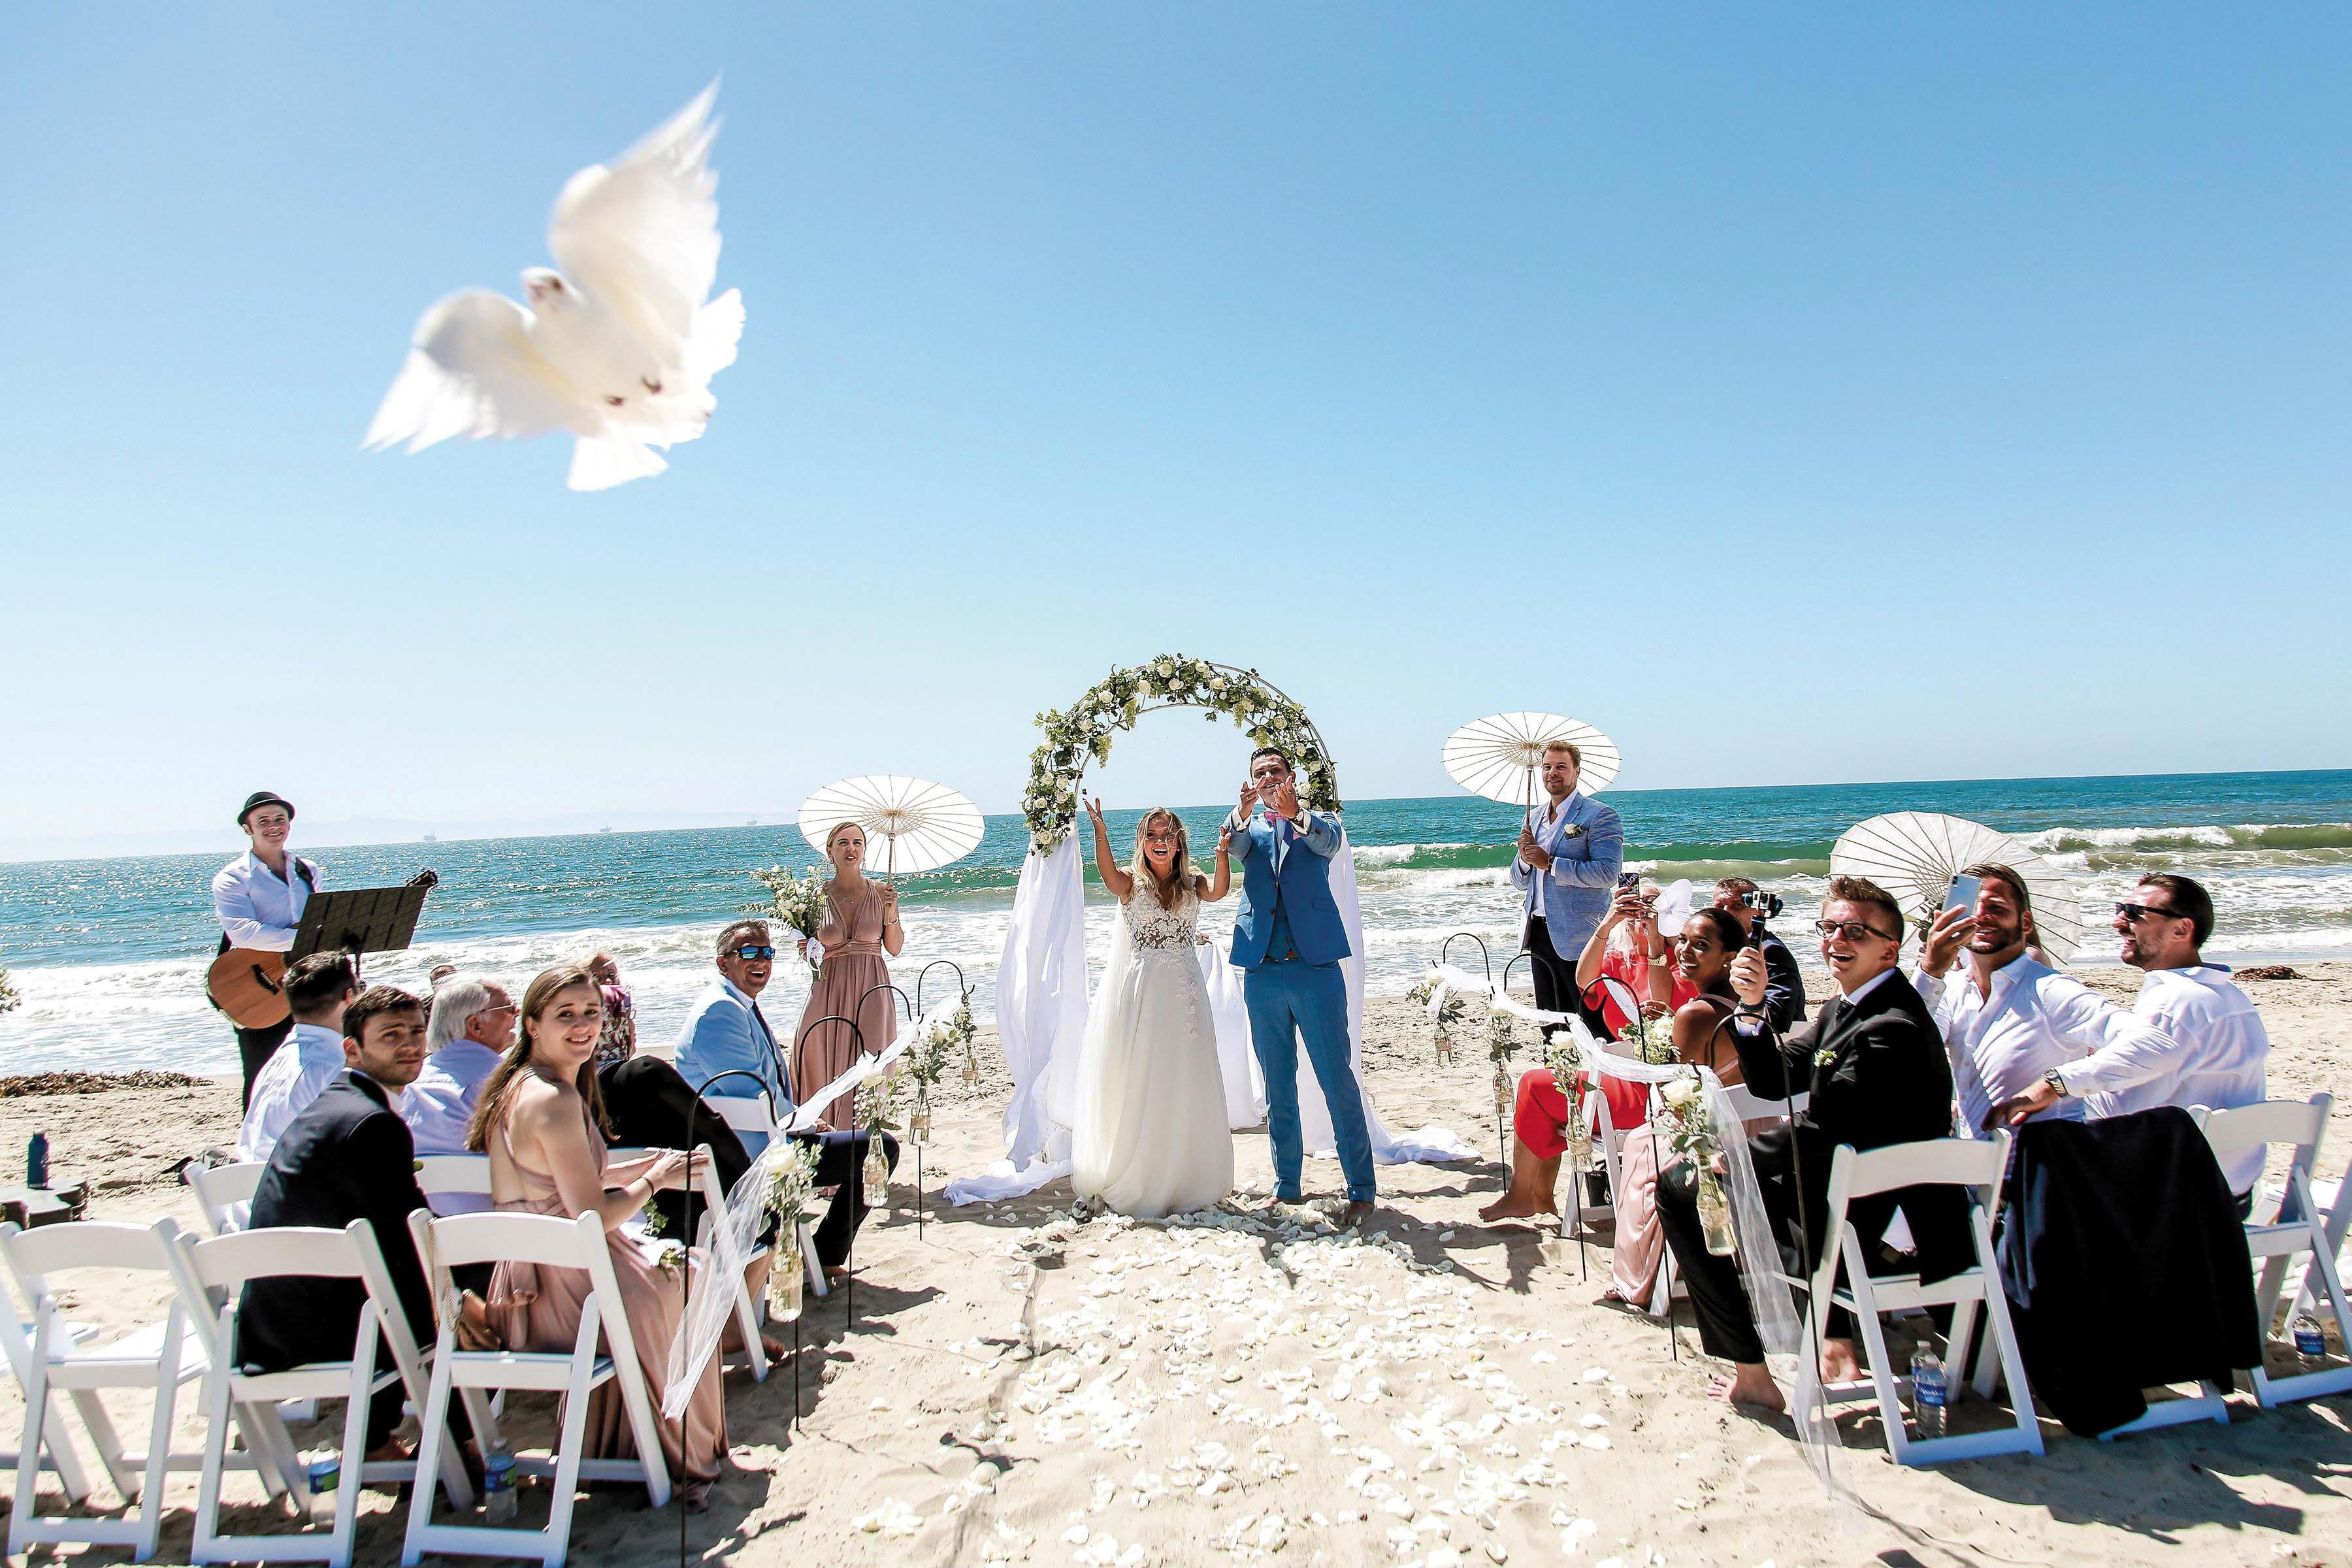 7b0a30163ada Love is abundant at this S.B. sand-and-sea wedding.Head Heart Photography